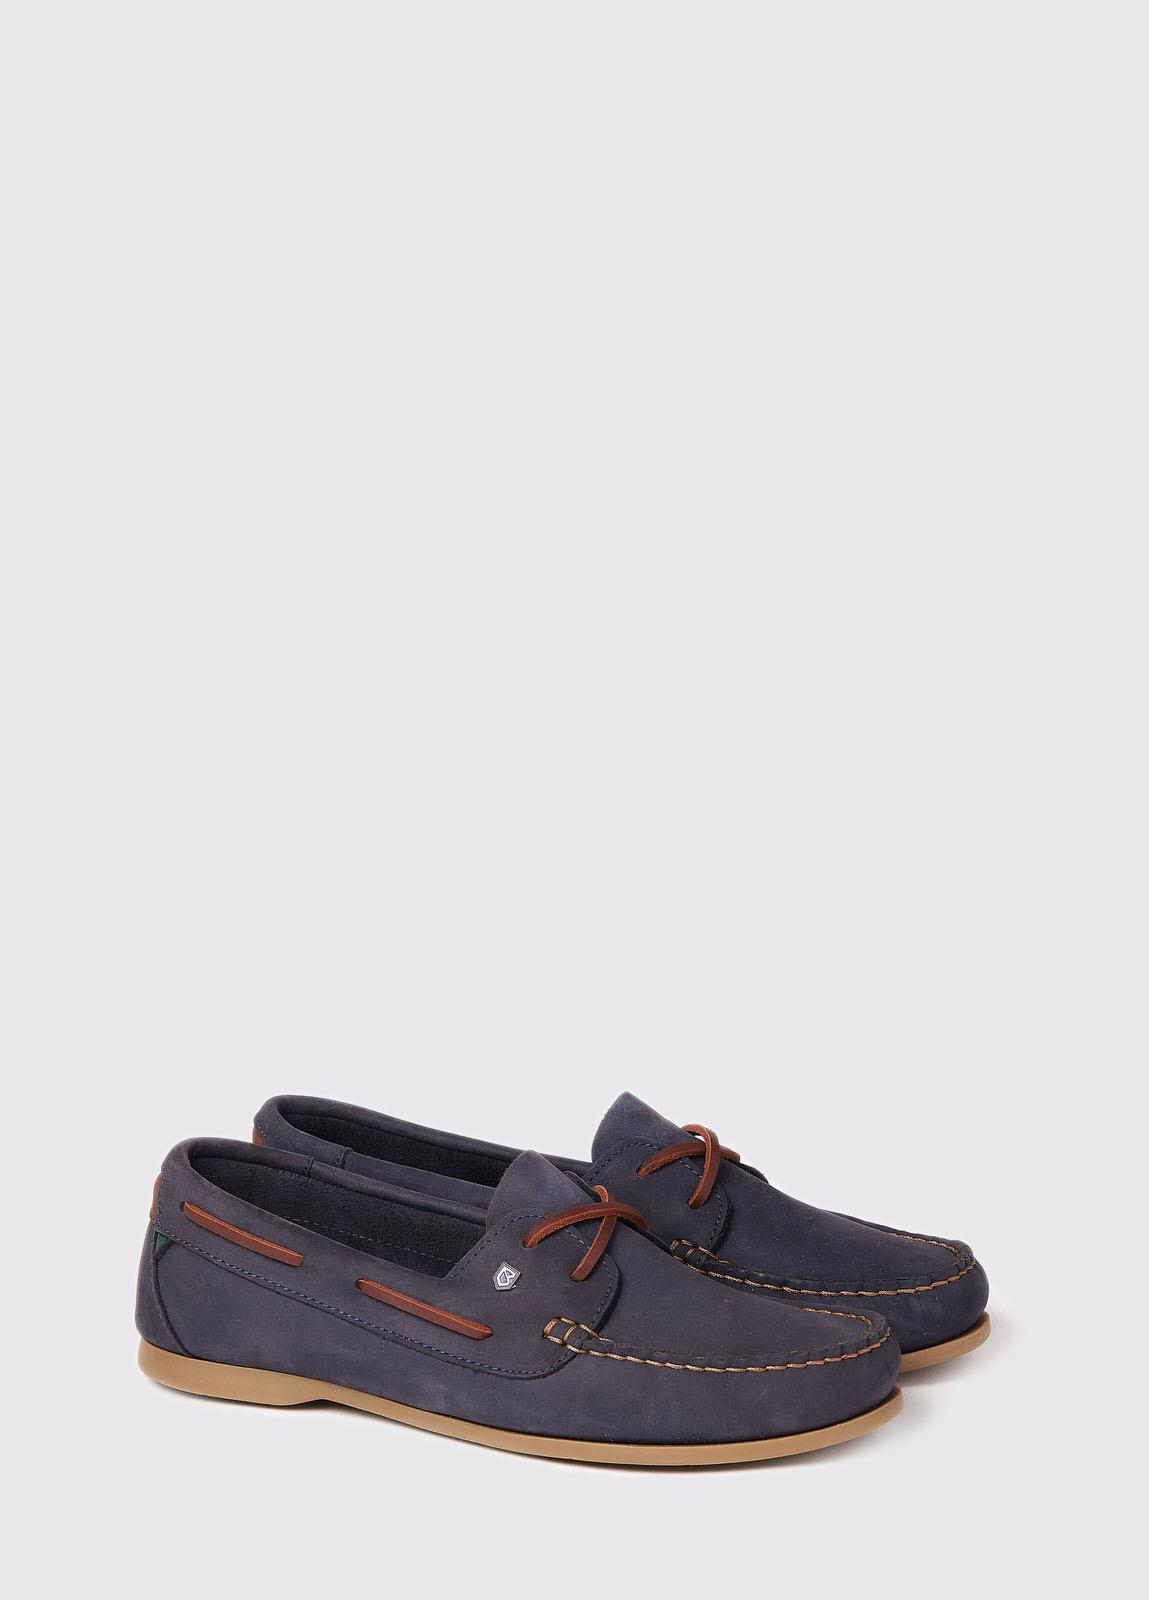 Aruba Deck Shoe - Denim